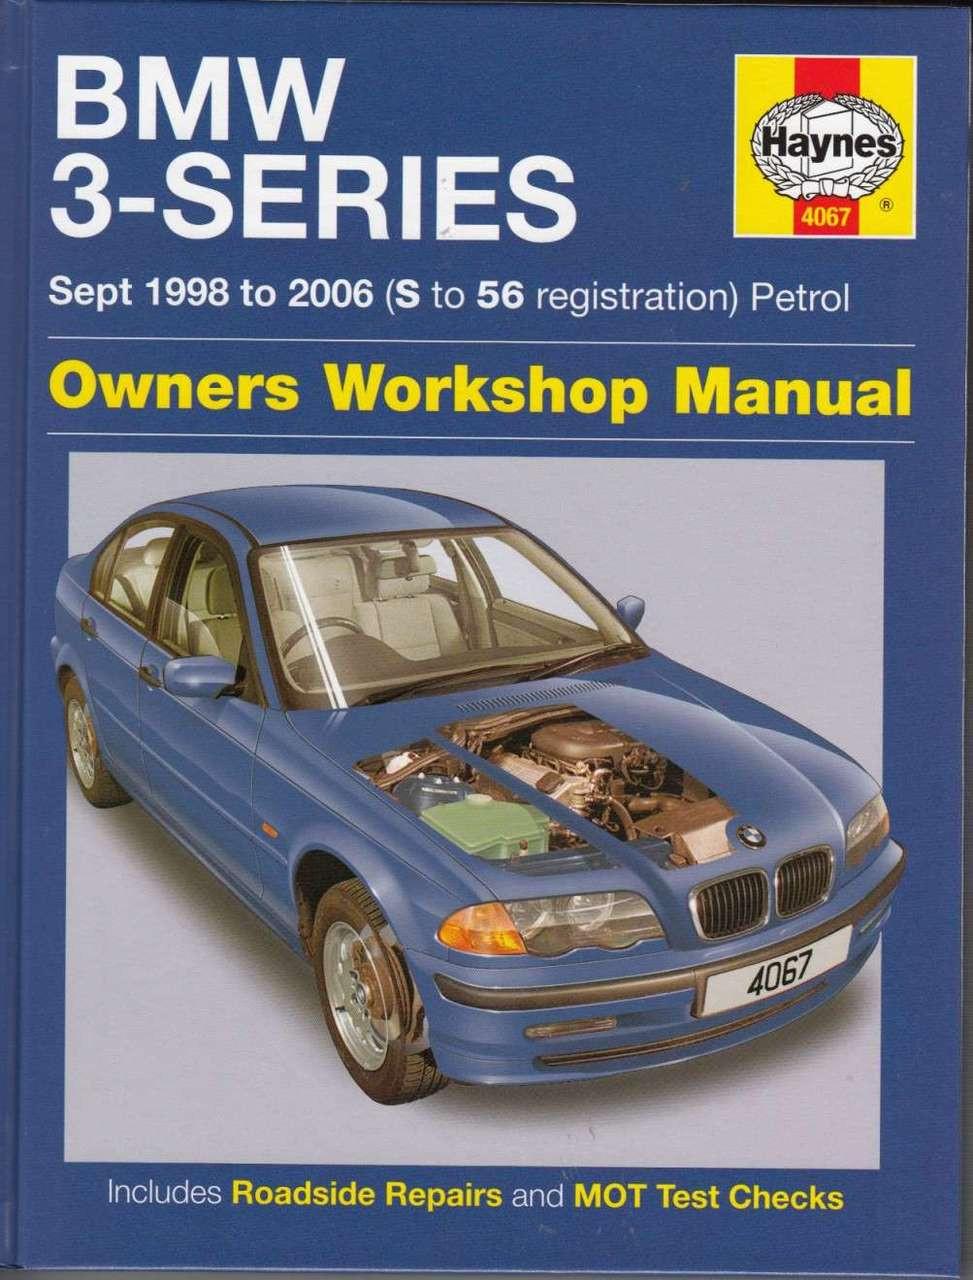 2004 bmw 330xi owners manual